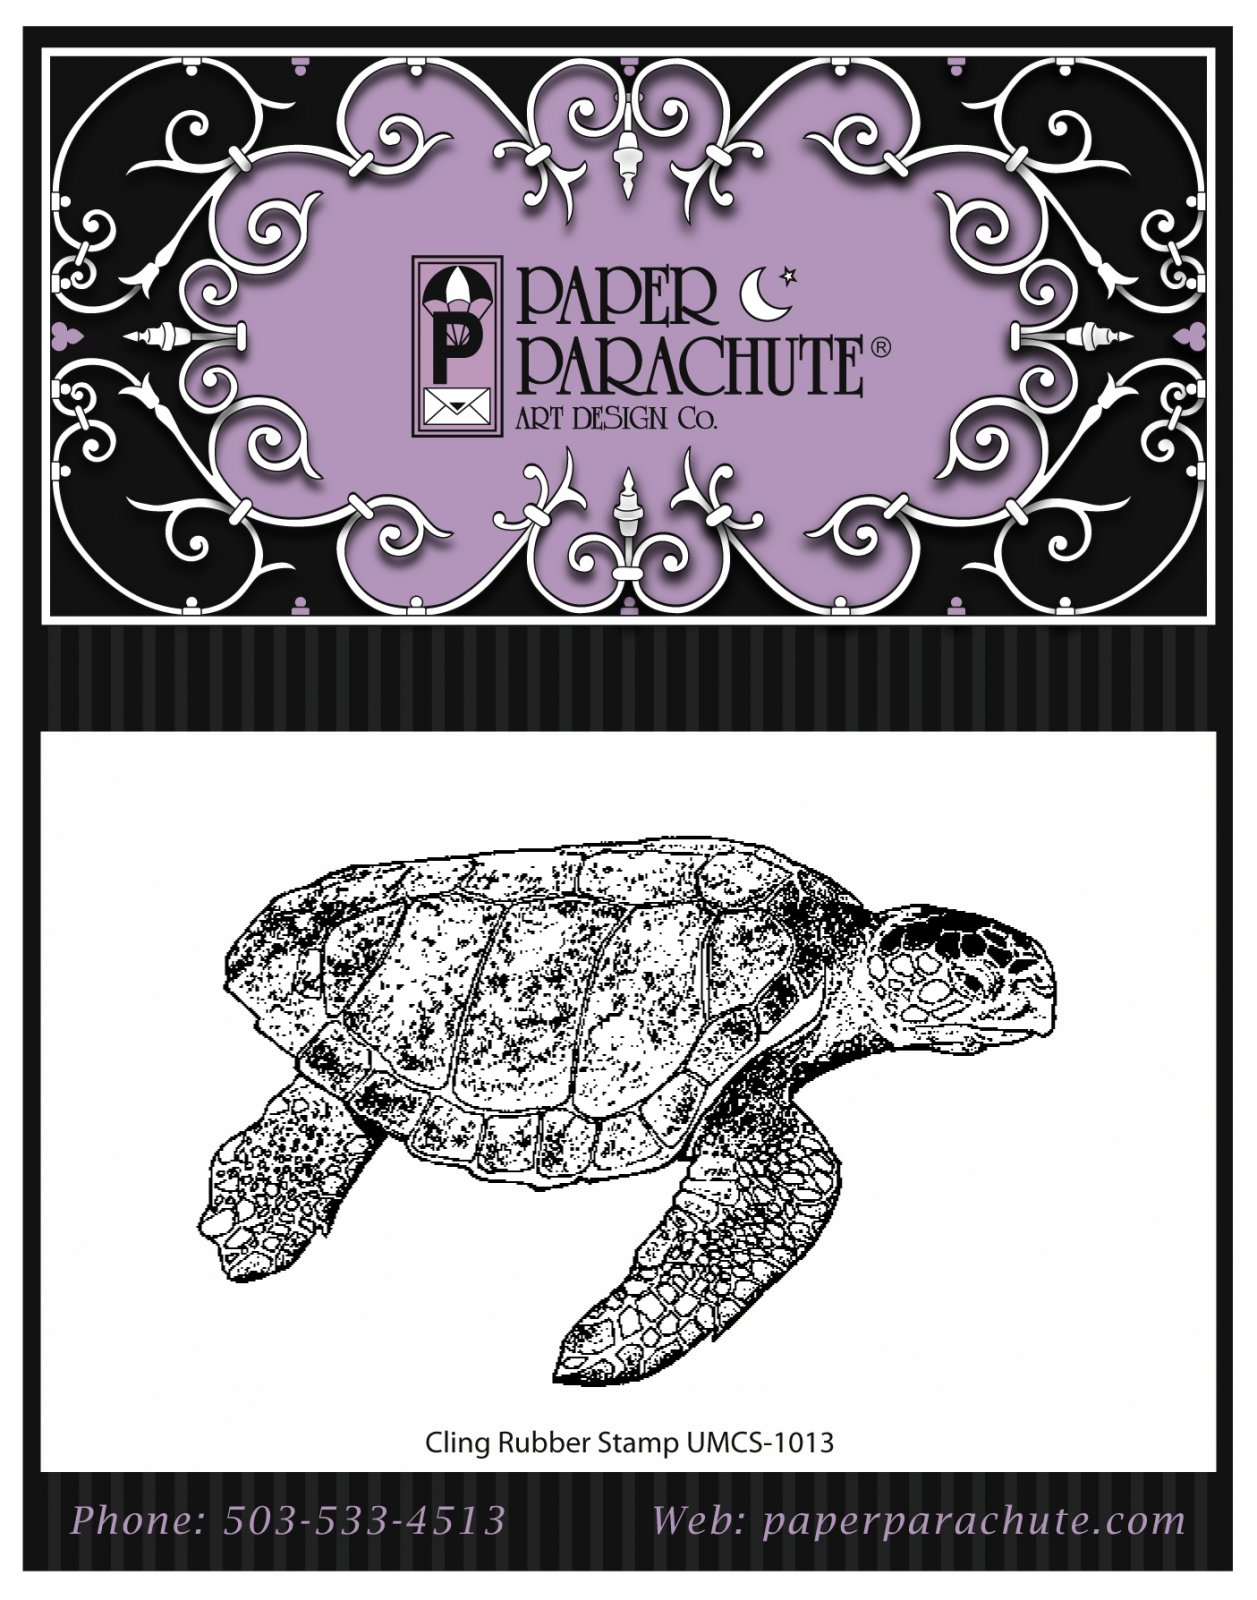 Paper Parachute Rubber Stamp - UMCS1013